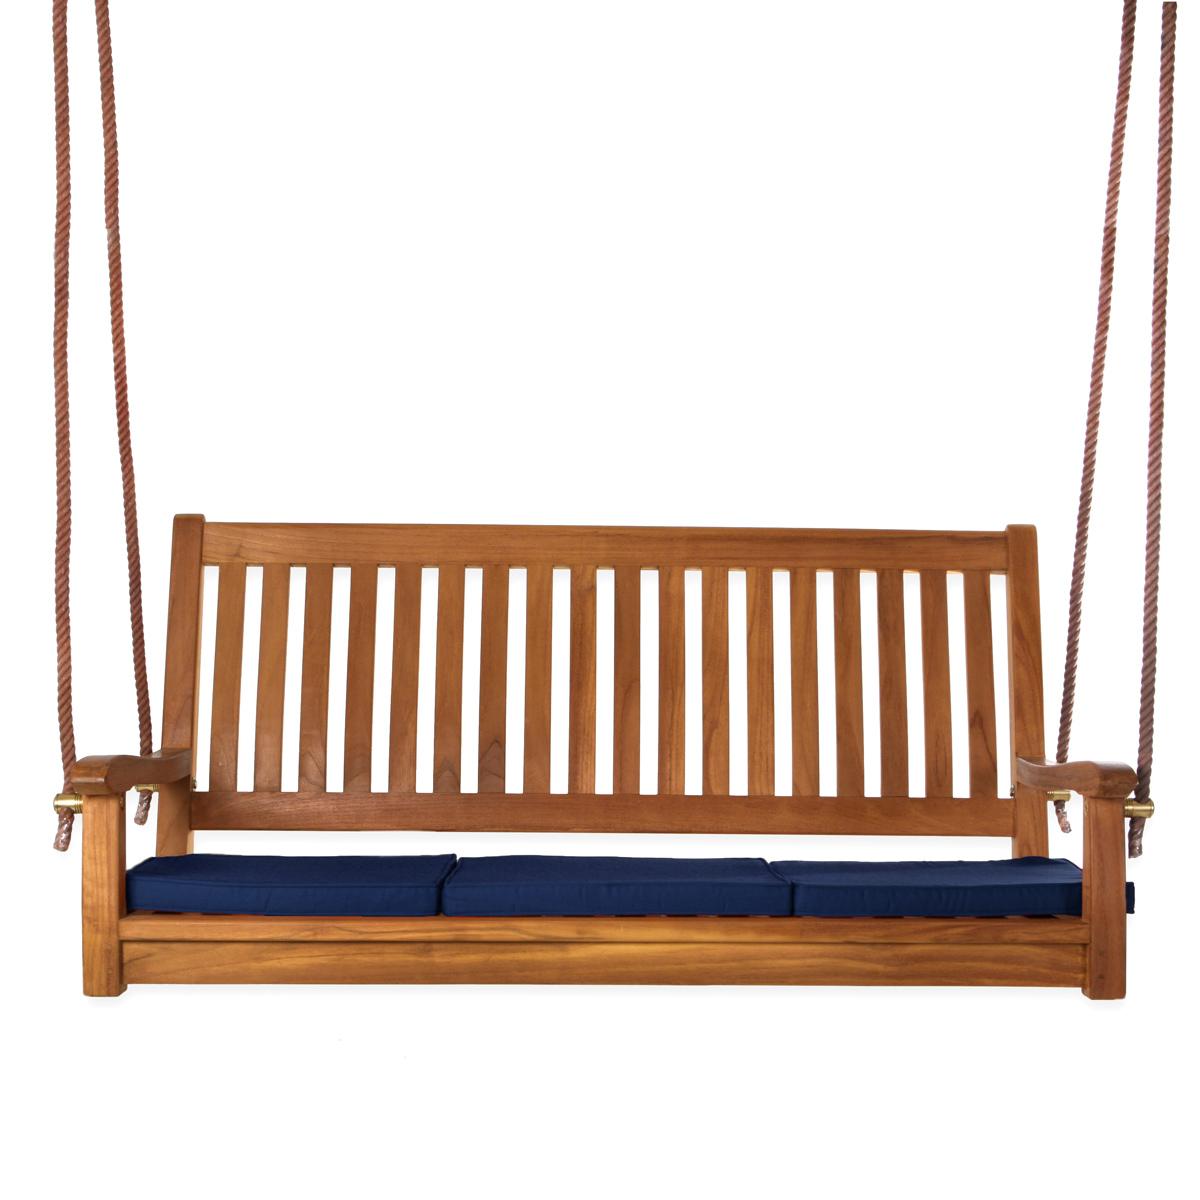 Teak Swing & Cushions, Red - All Things Cedar TS50-R